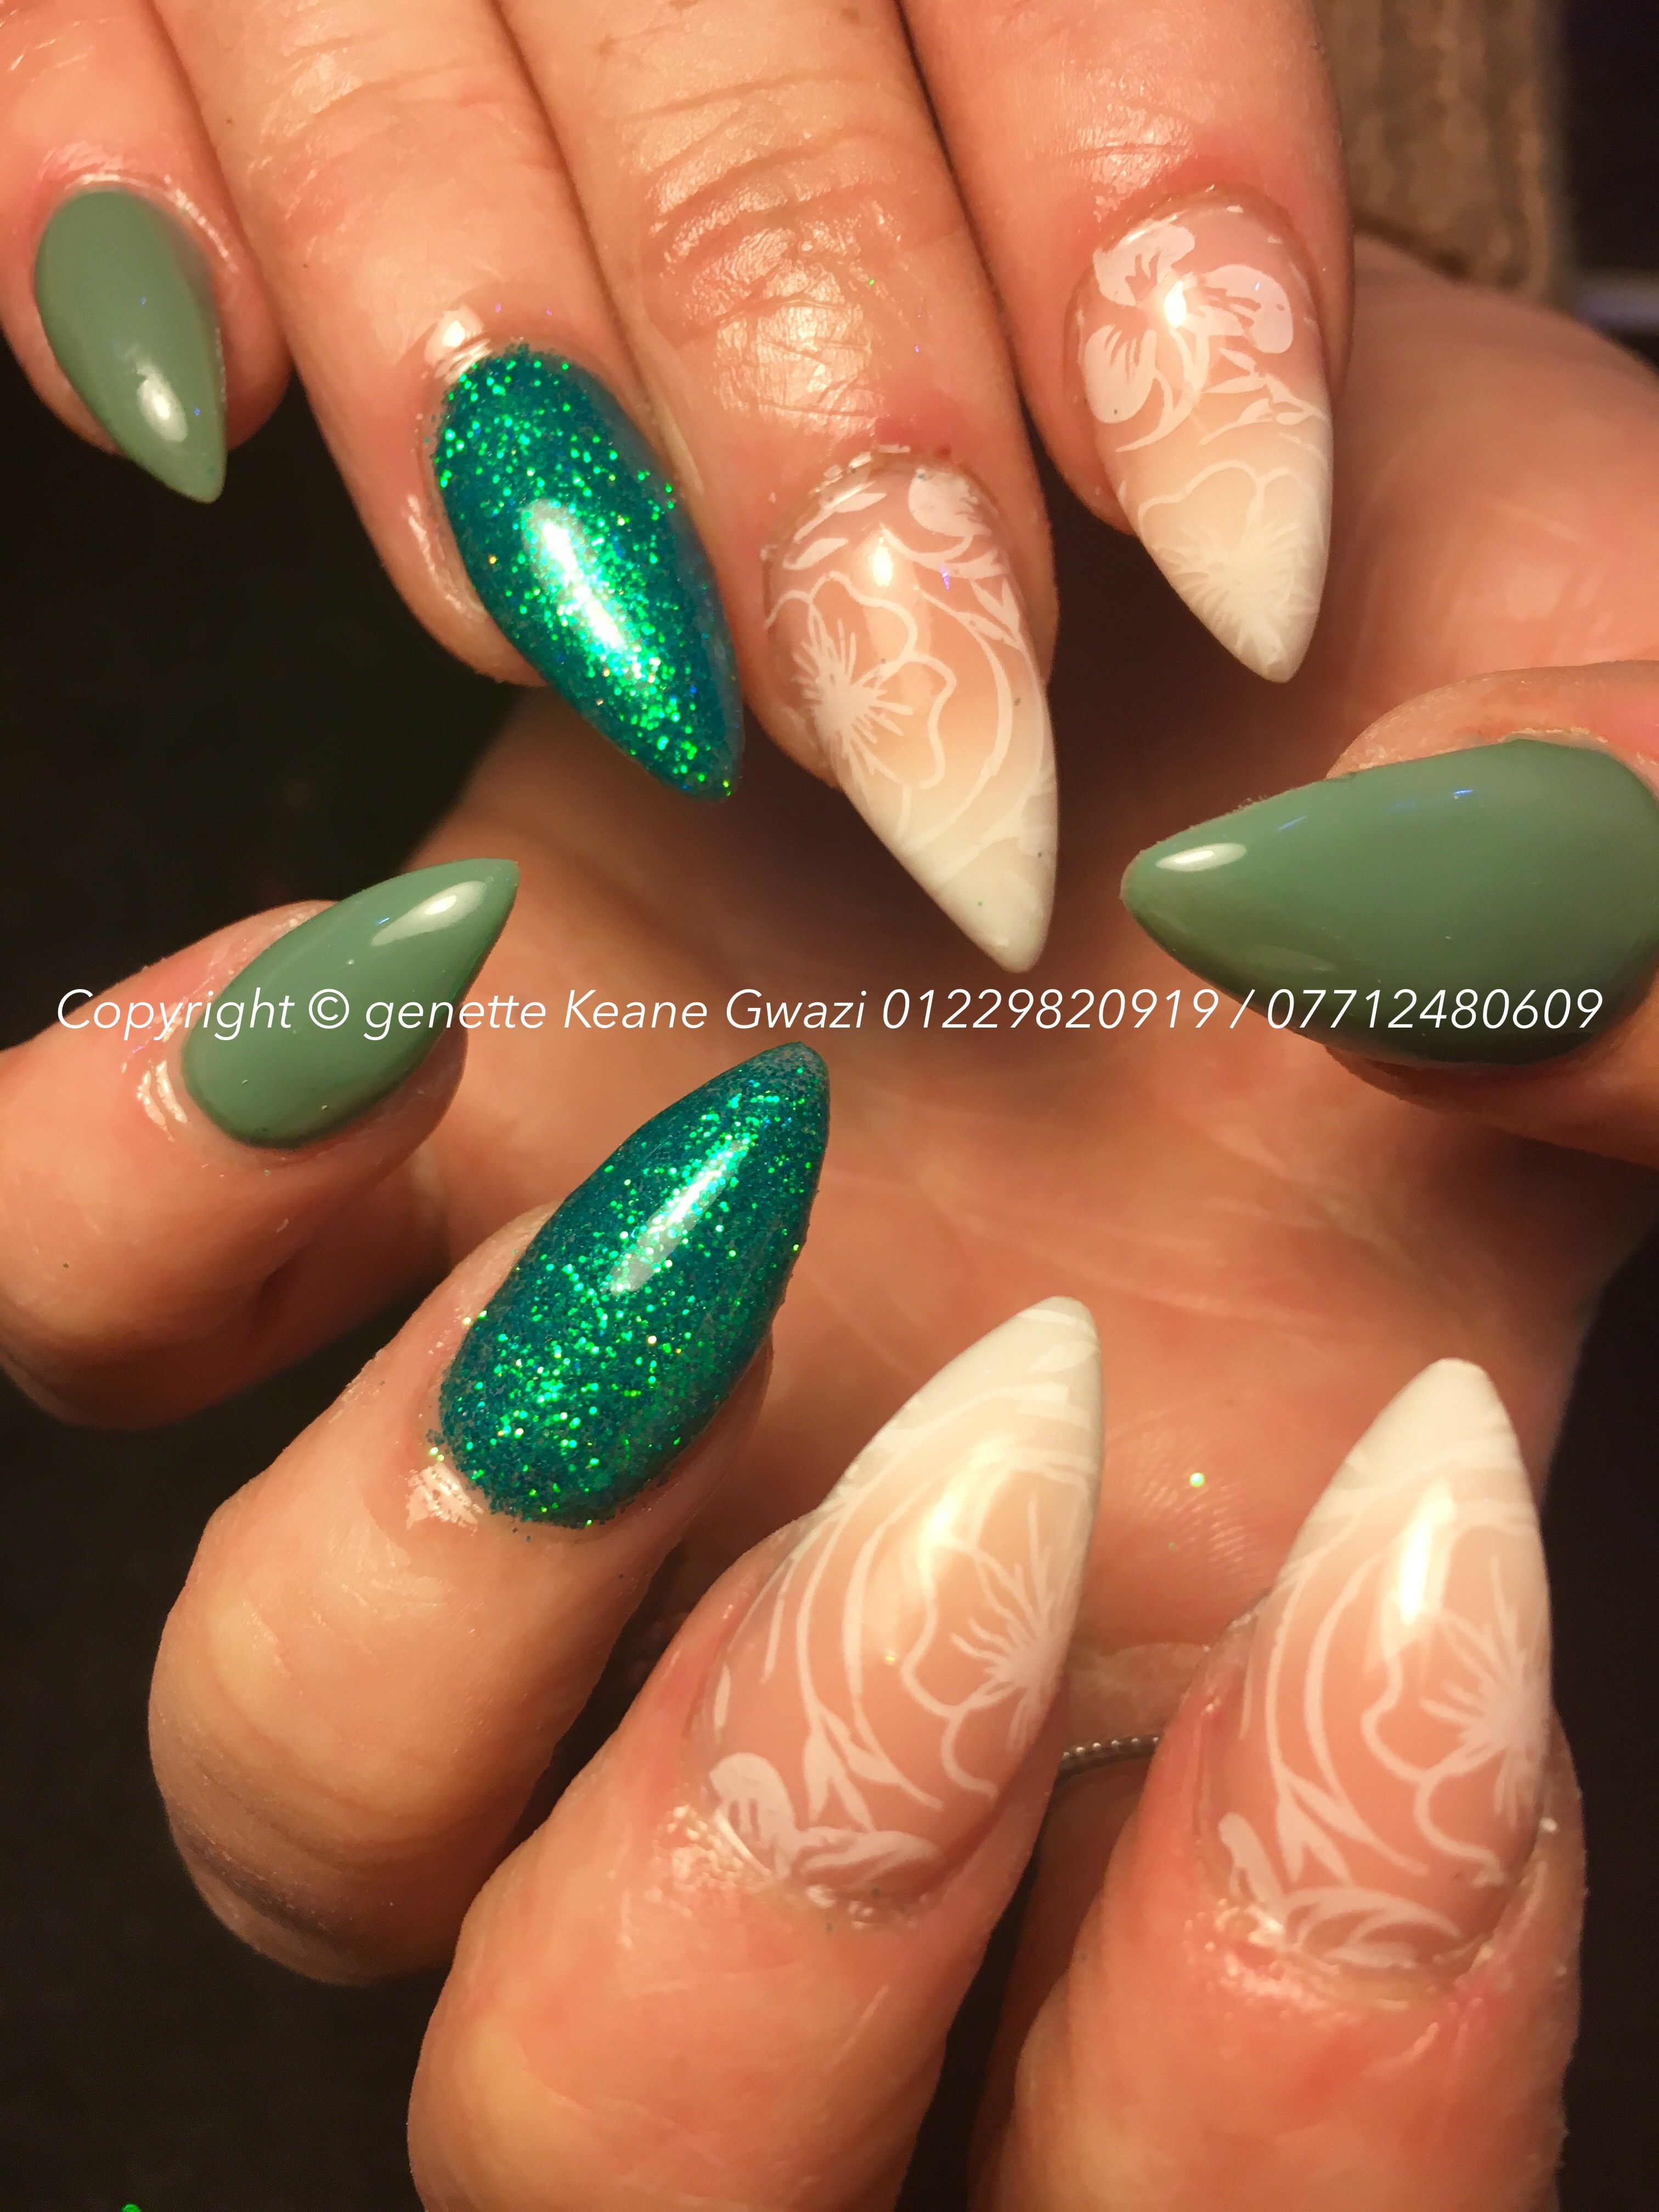 Mermaid green acrylic nails, holographic glitter, ombre nail art ...